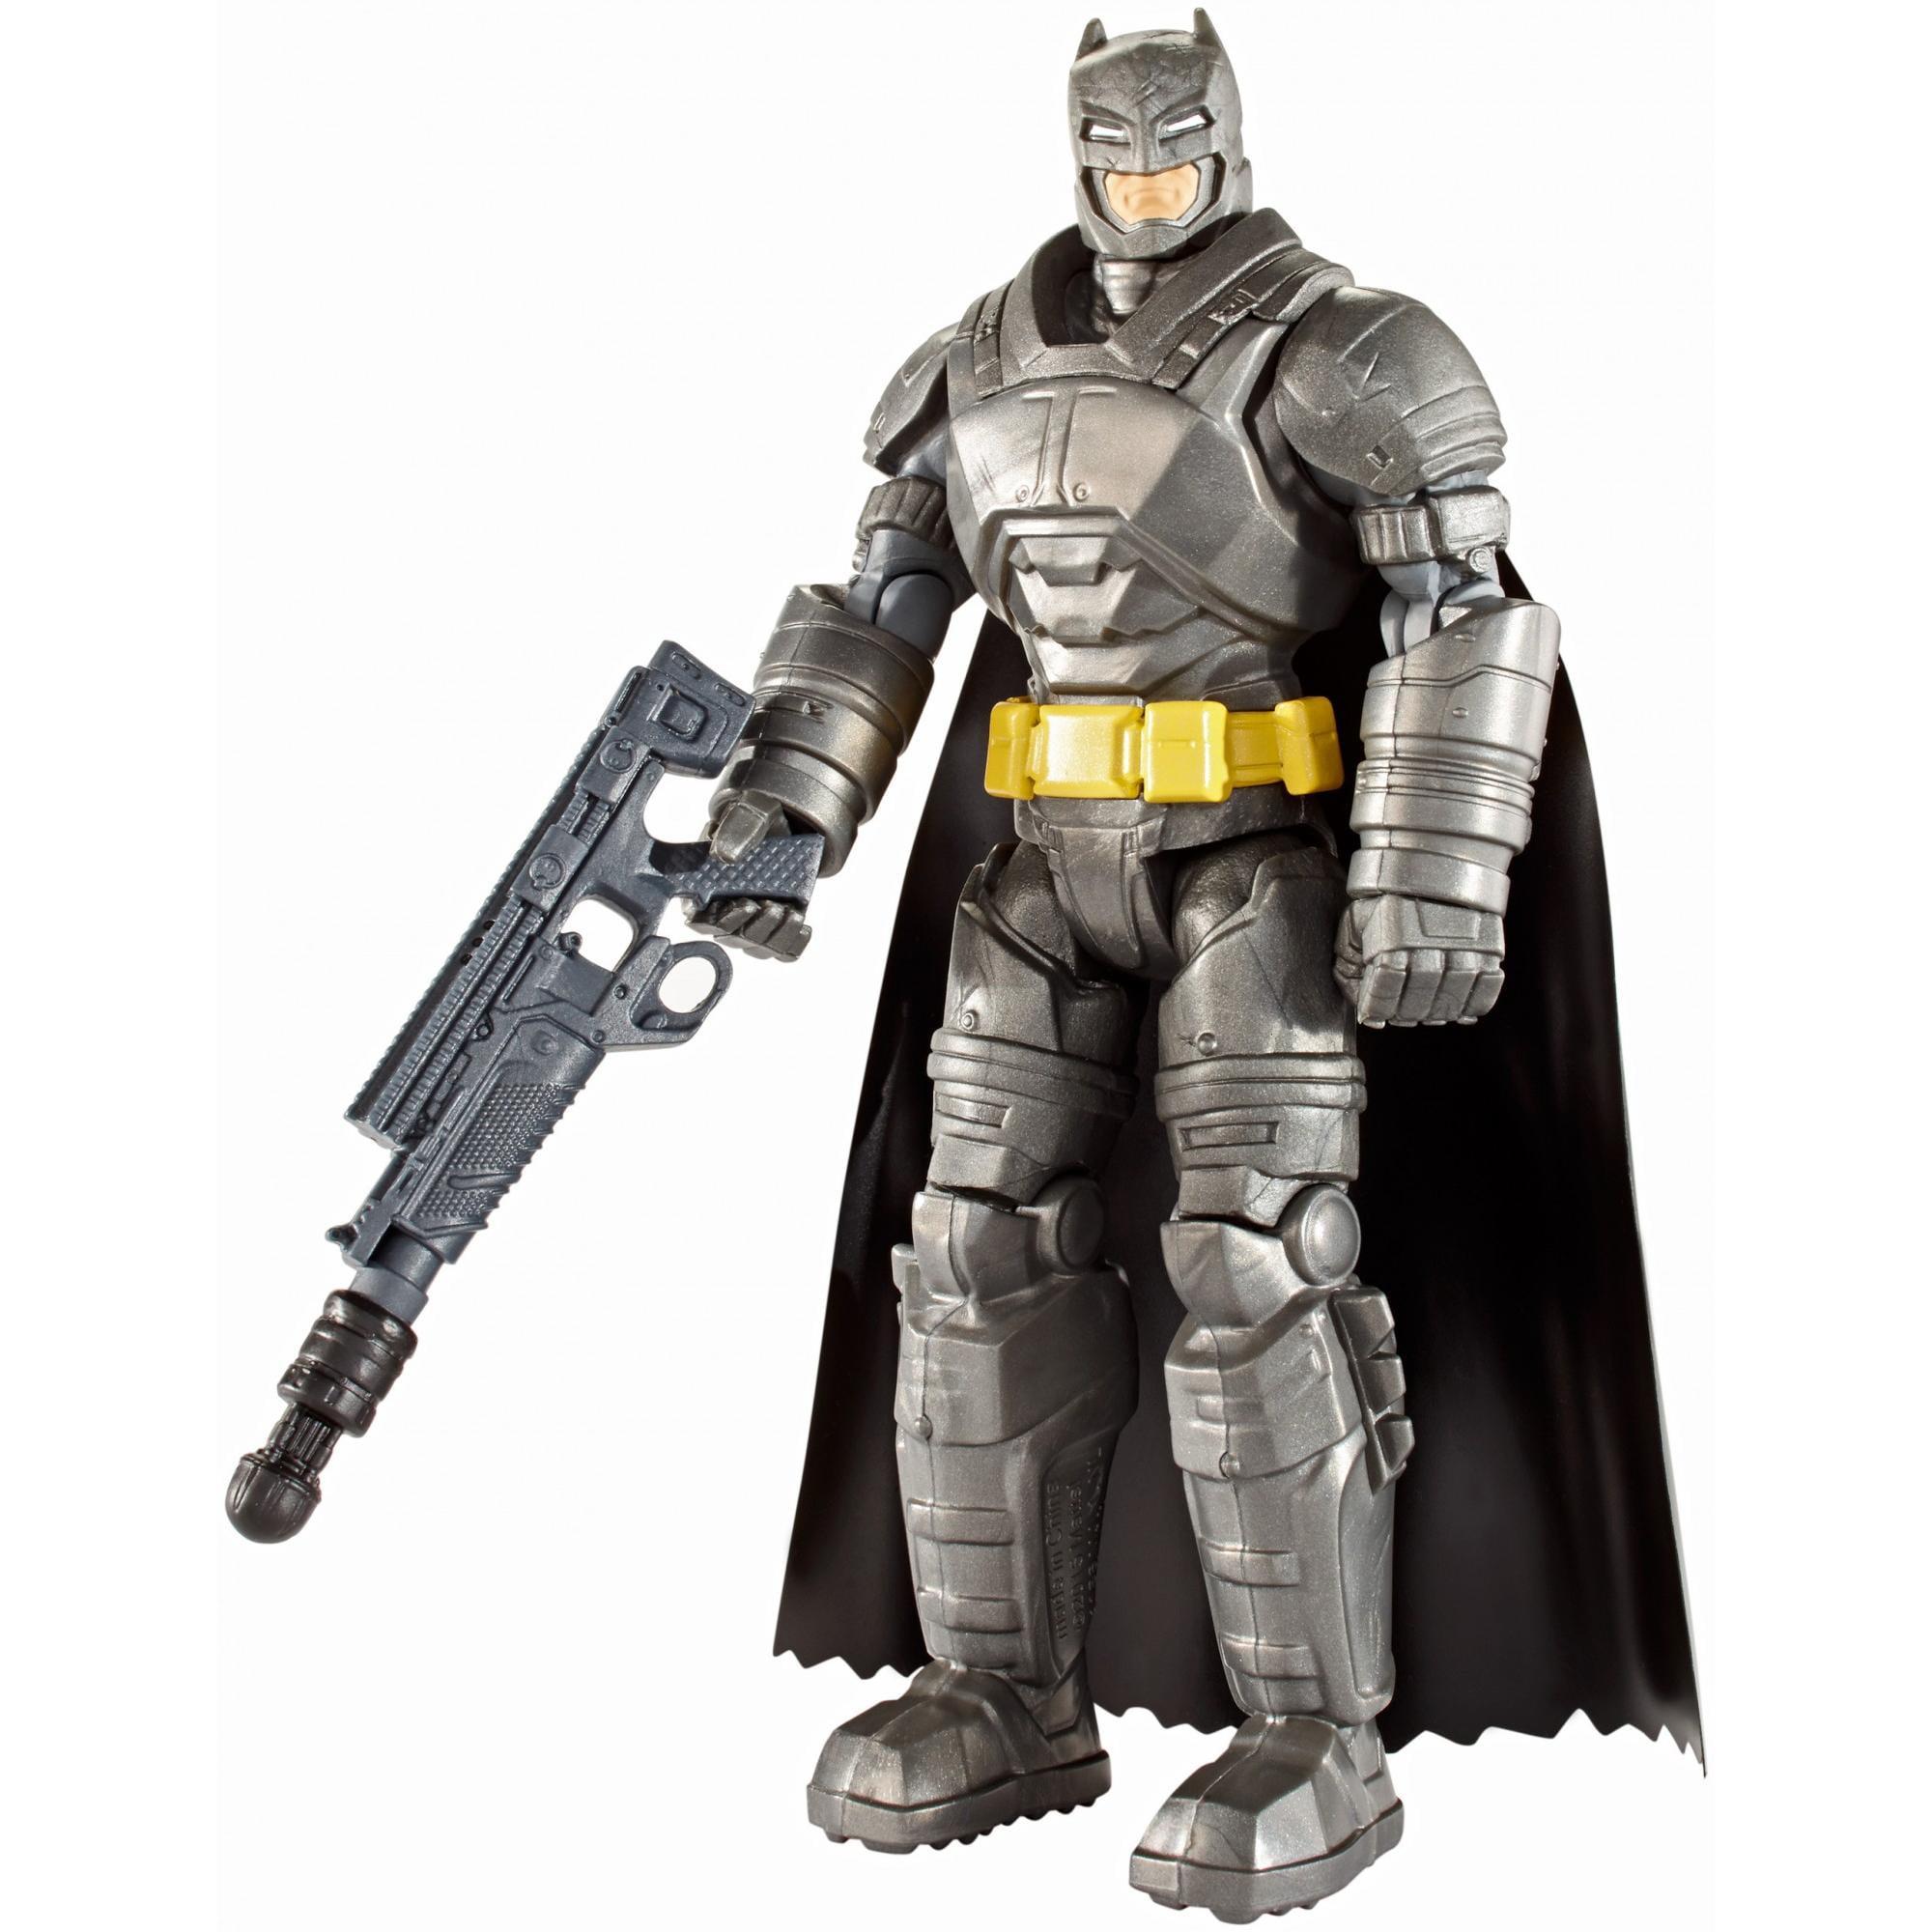 Batman Vs Superman Ultimate Batcave Playset